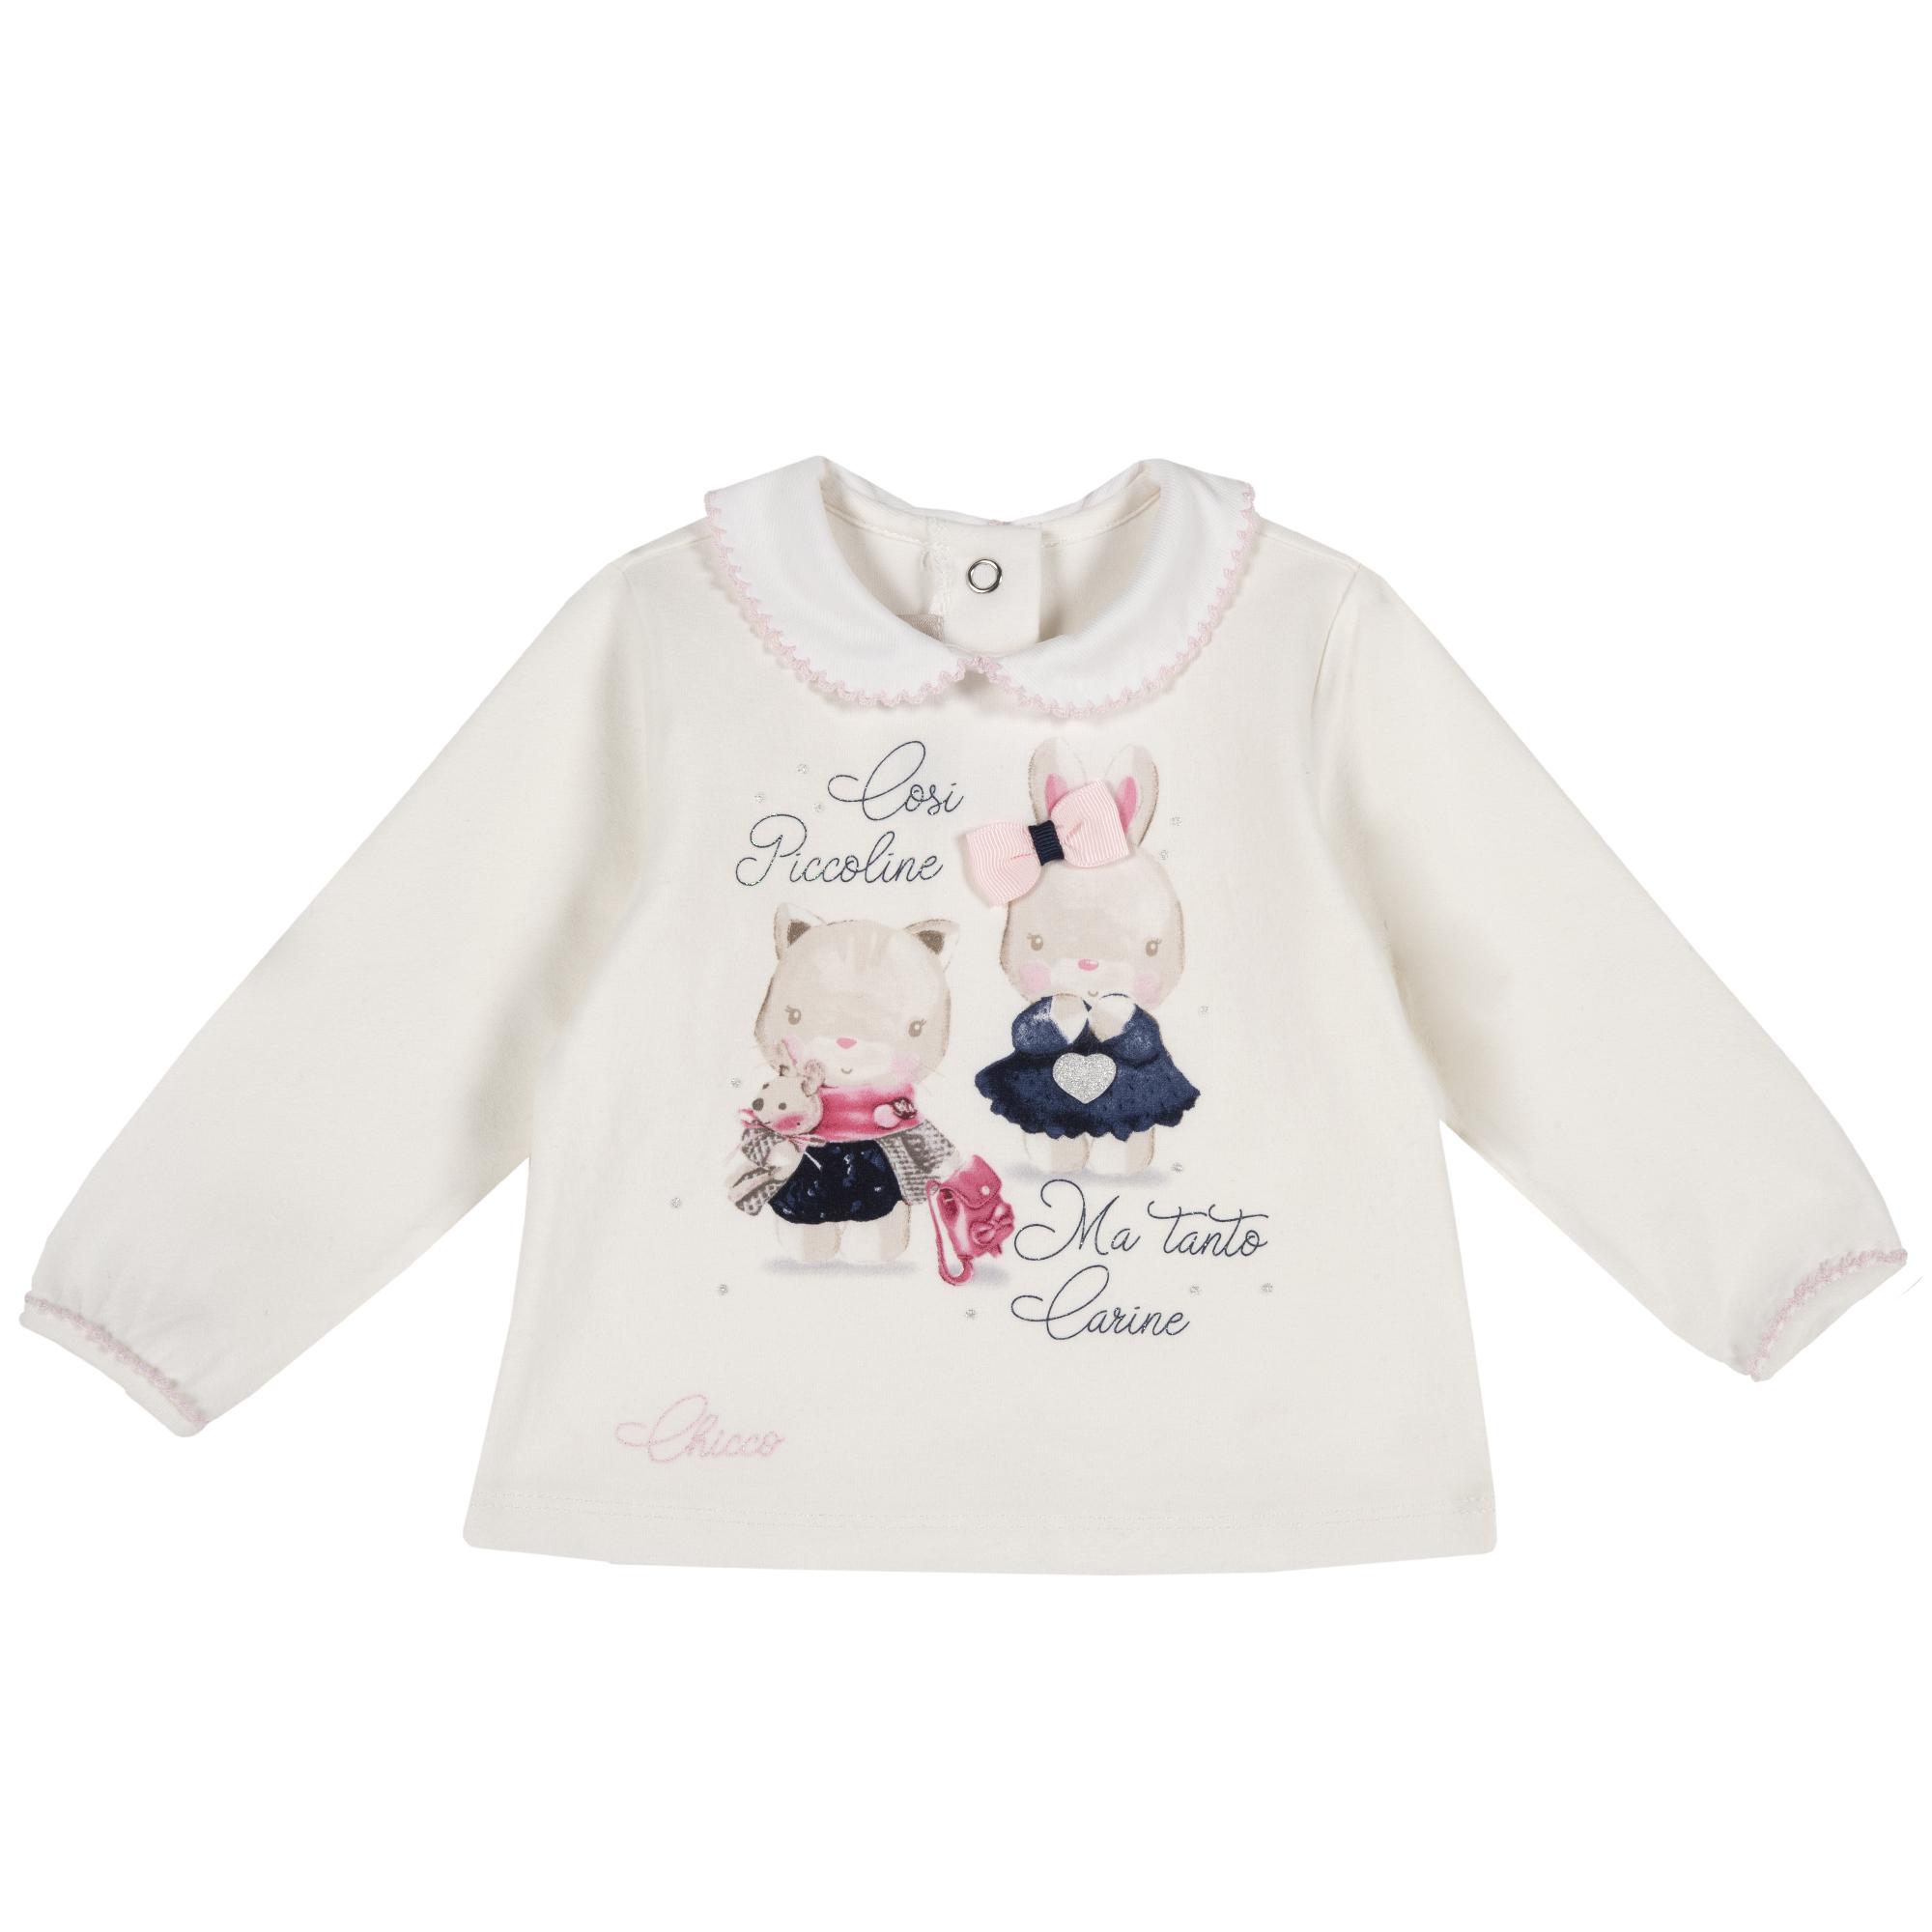 Bluza Copii Chicco, Guler, 68642 imagine